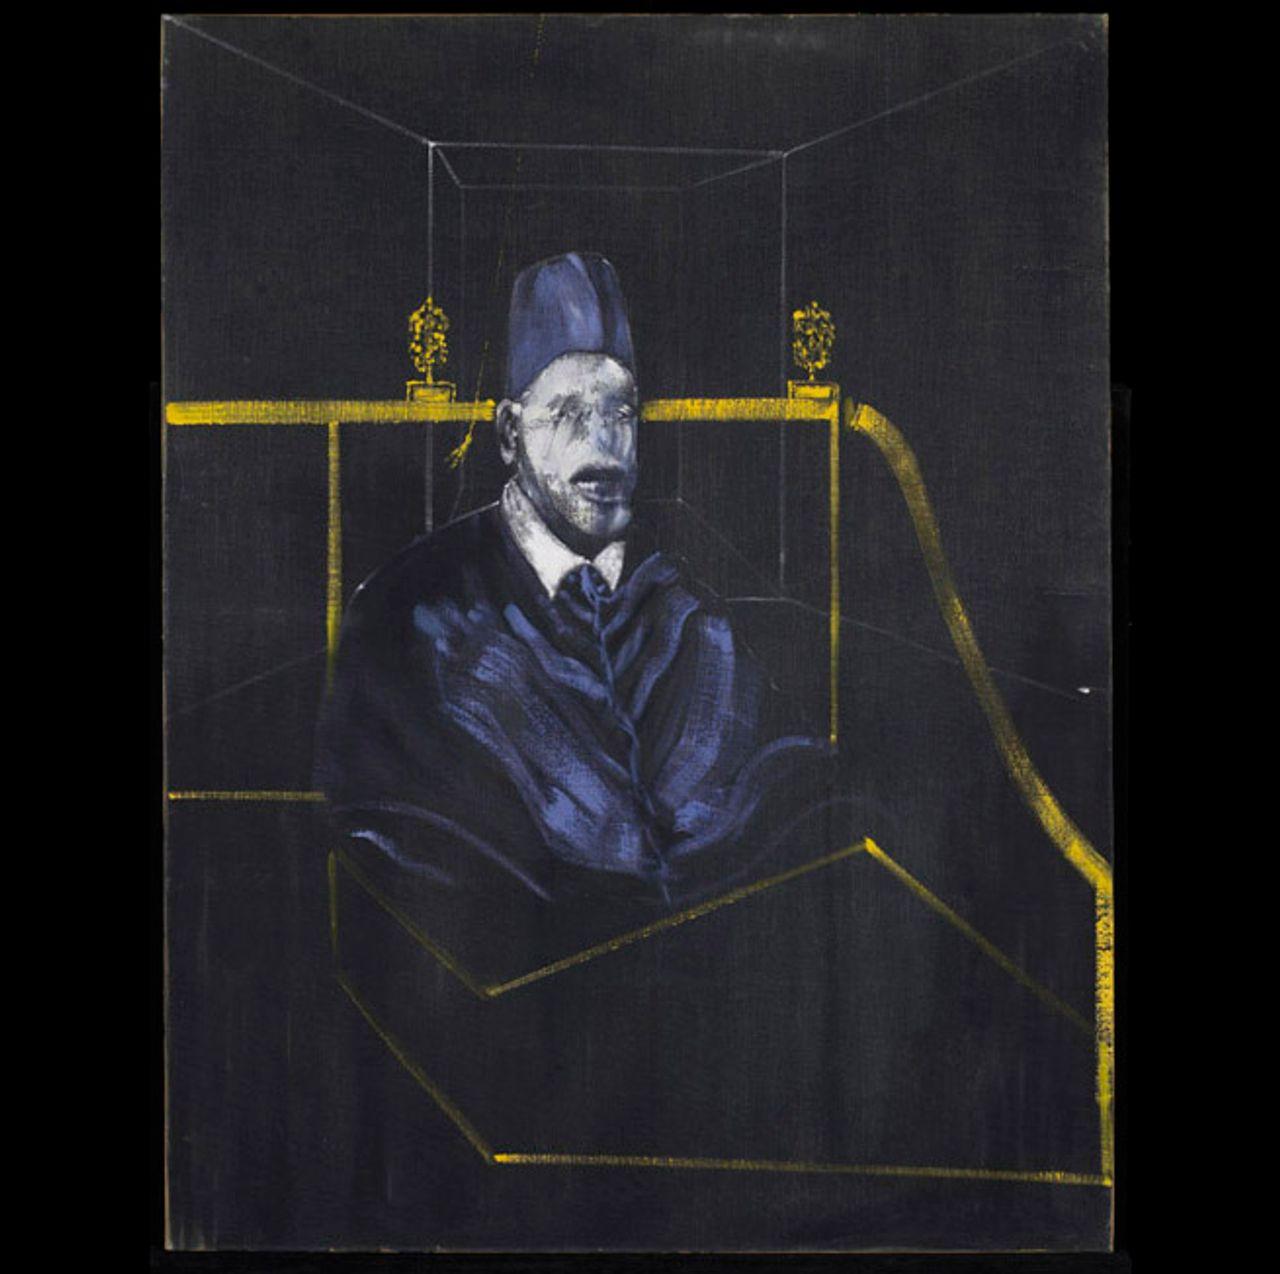 Francis Bacon, Study for Portrait VI (1953) © Estate of Francis Bacon / SODRAC (2013)